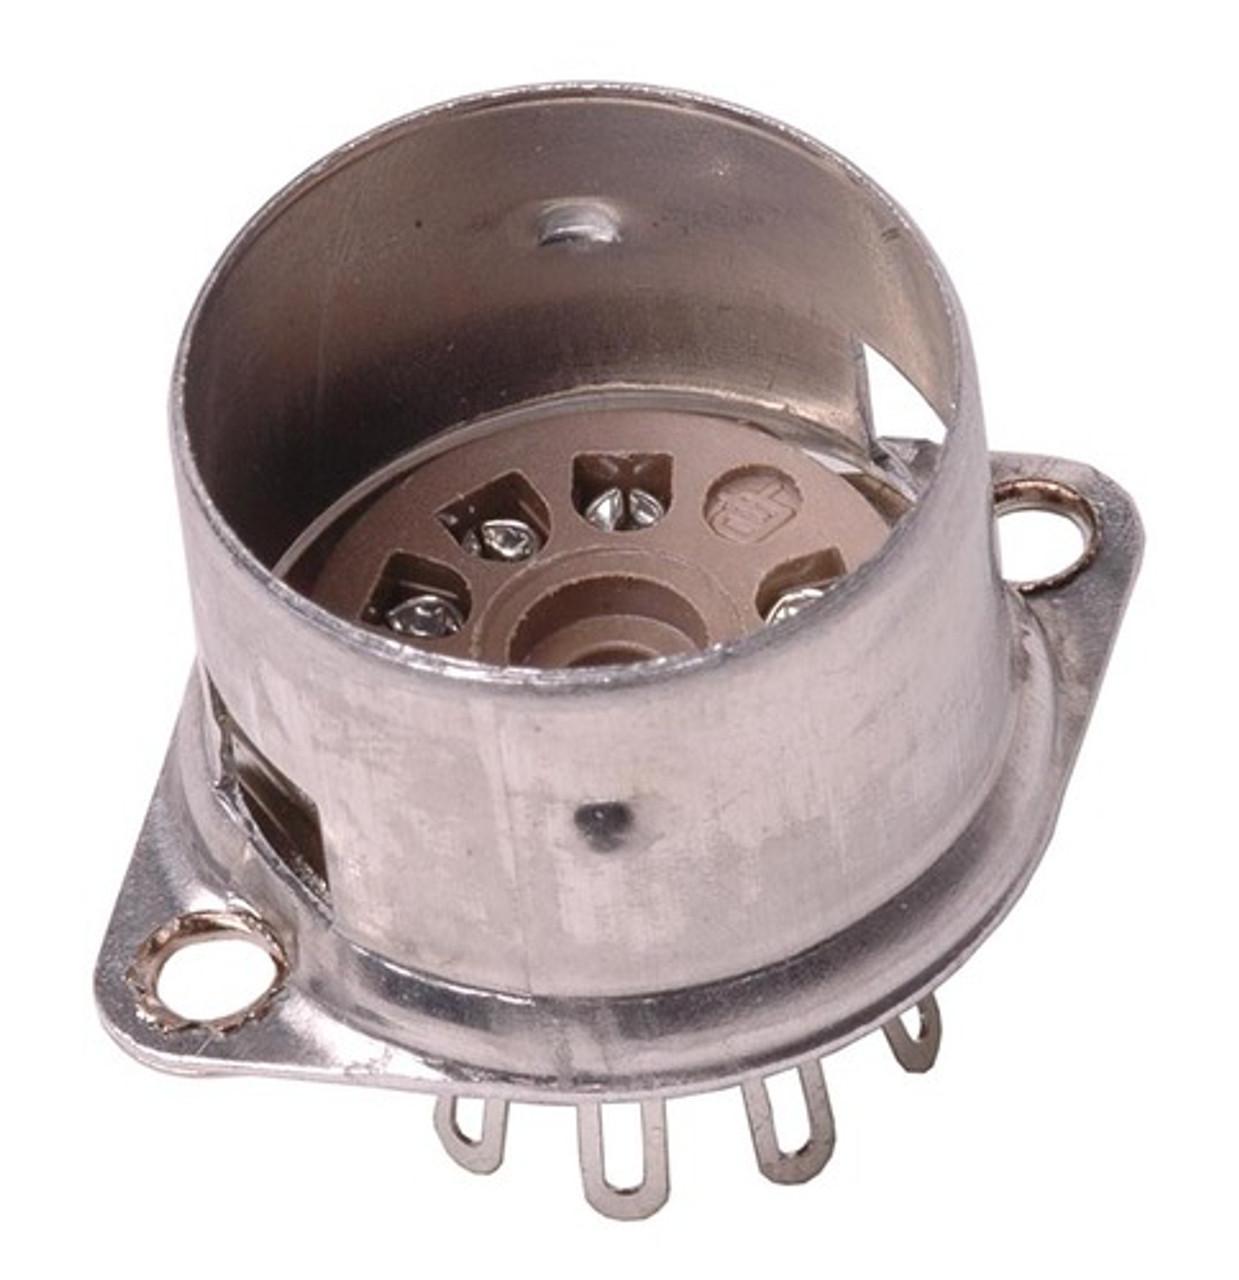 Belton - 9 Pin Mini Tube Socket With Shield Base (solder)